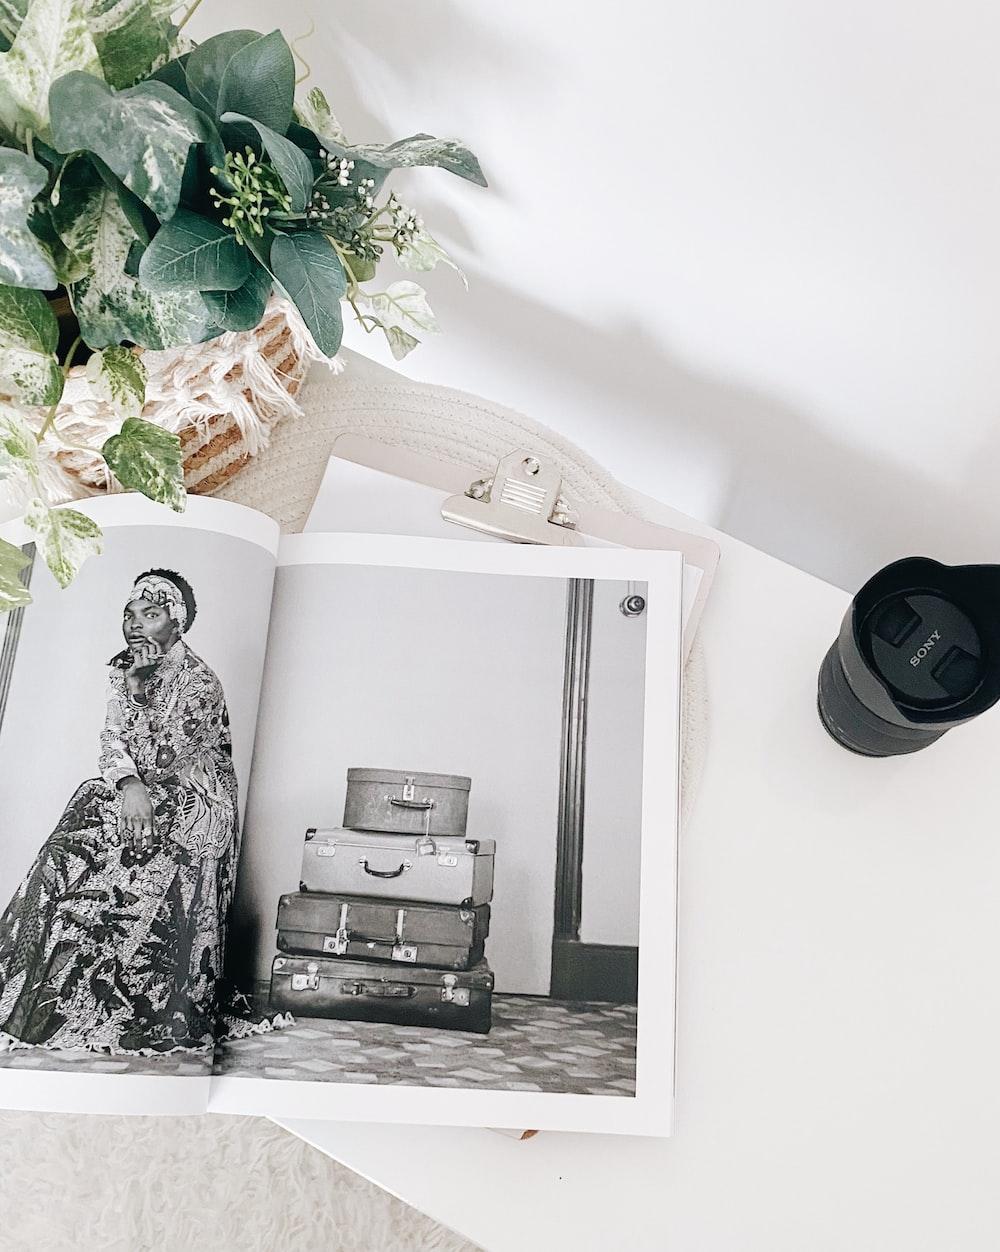 black and white printer on white wooden table